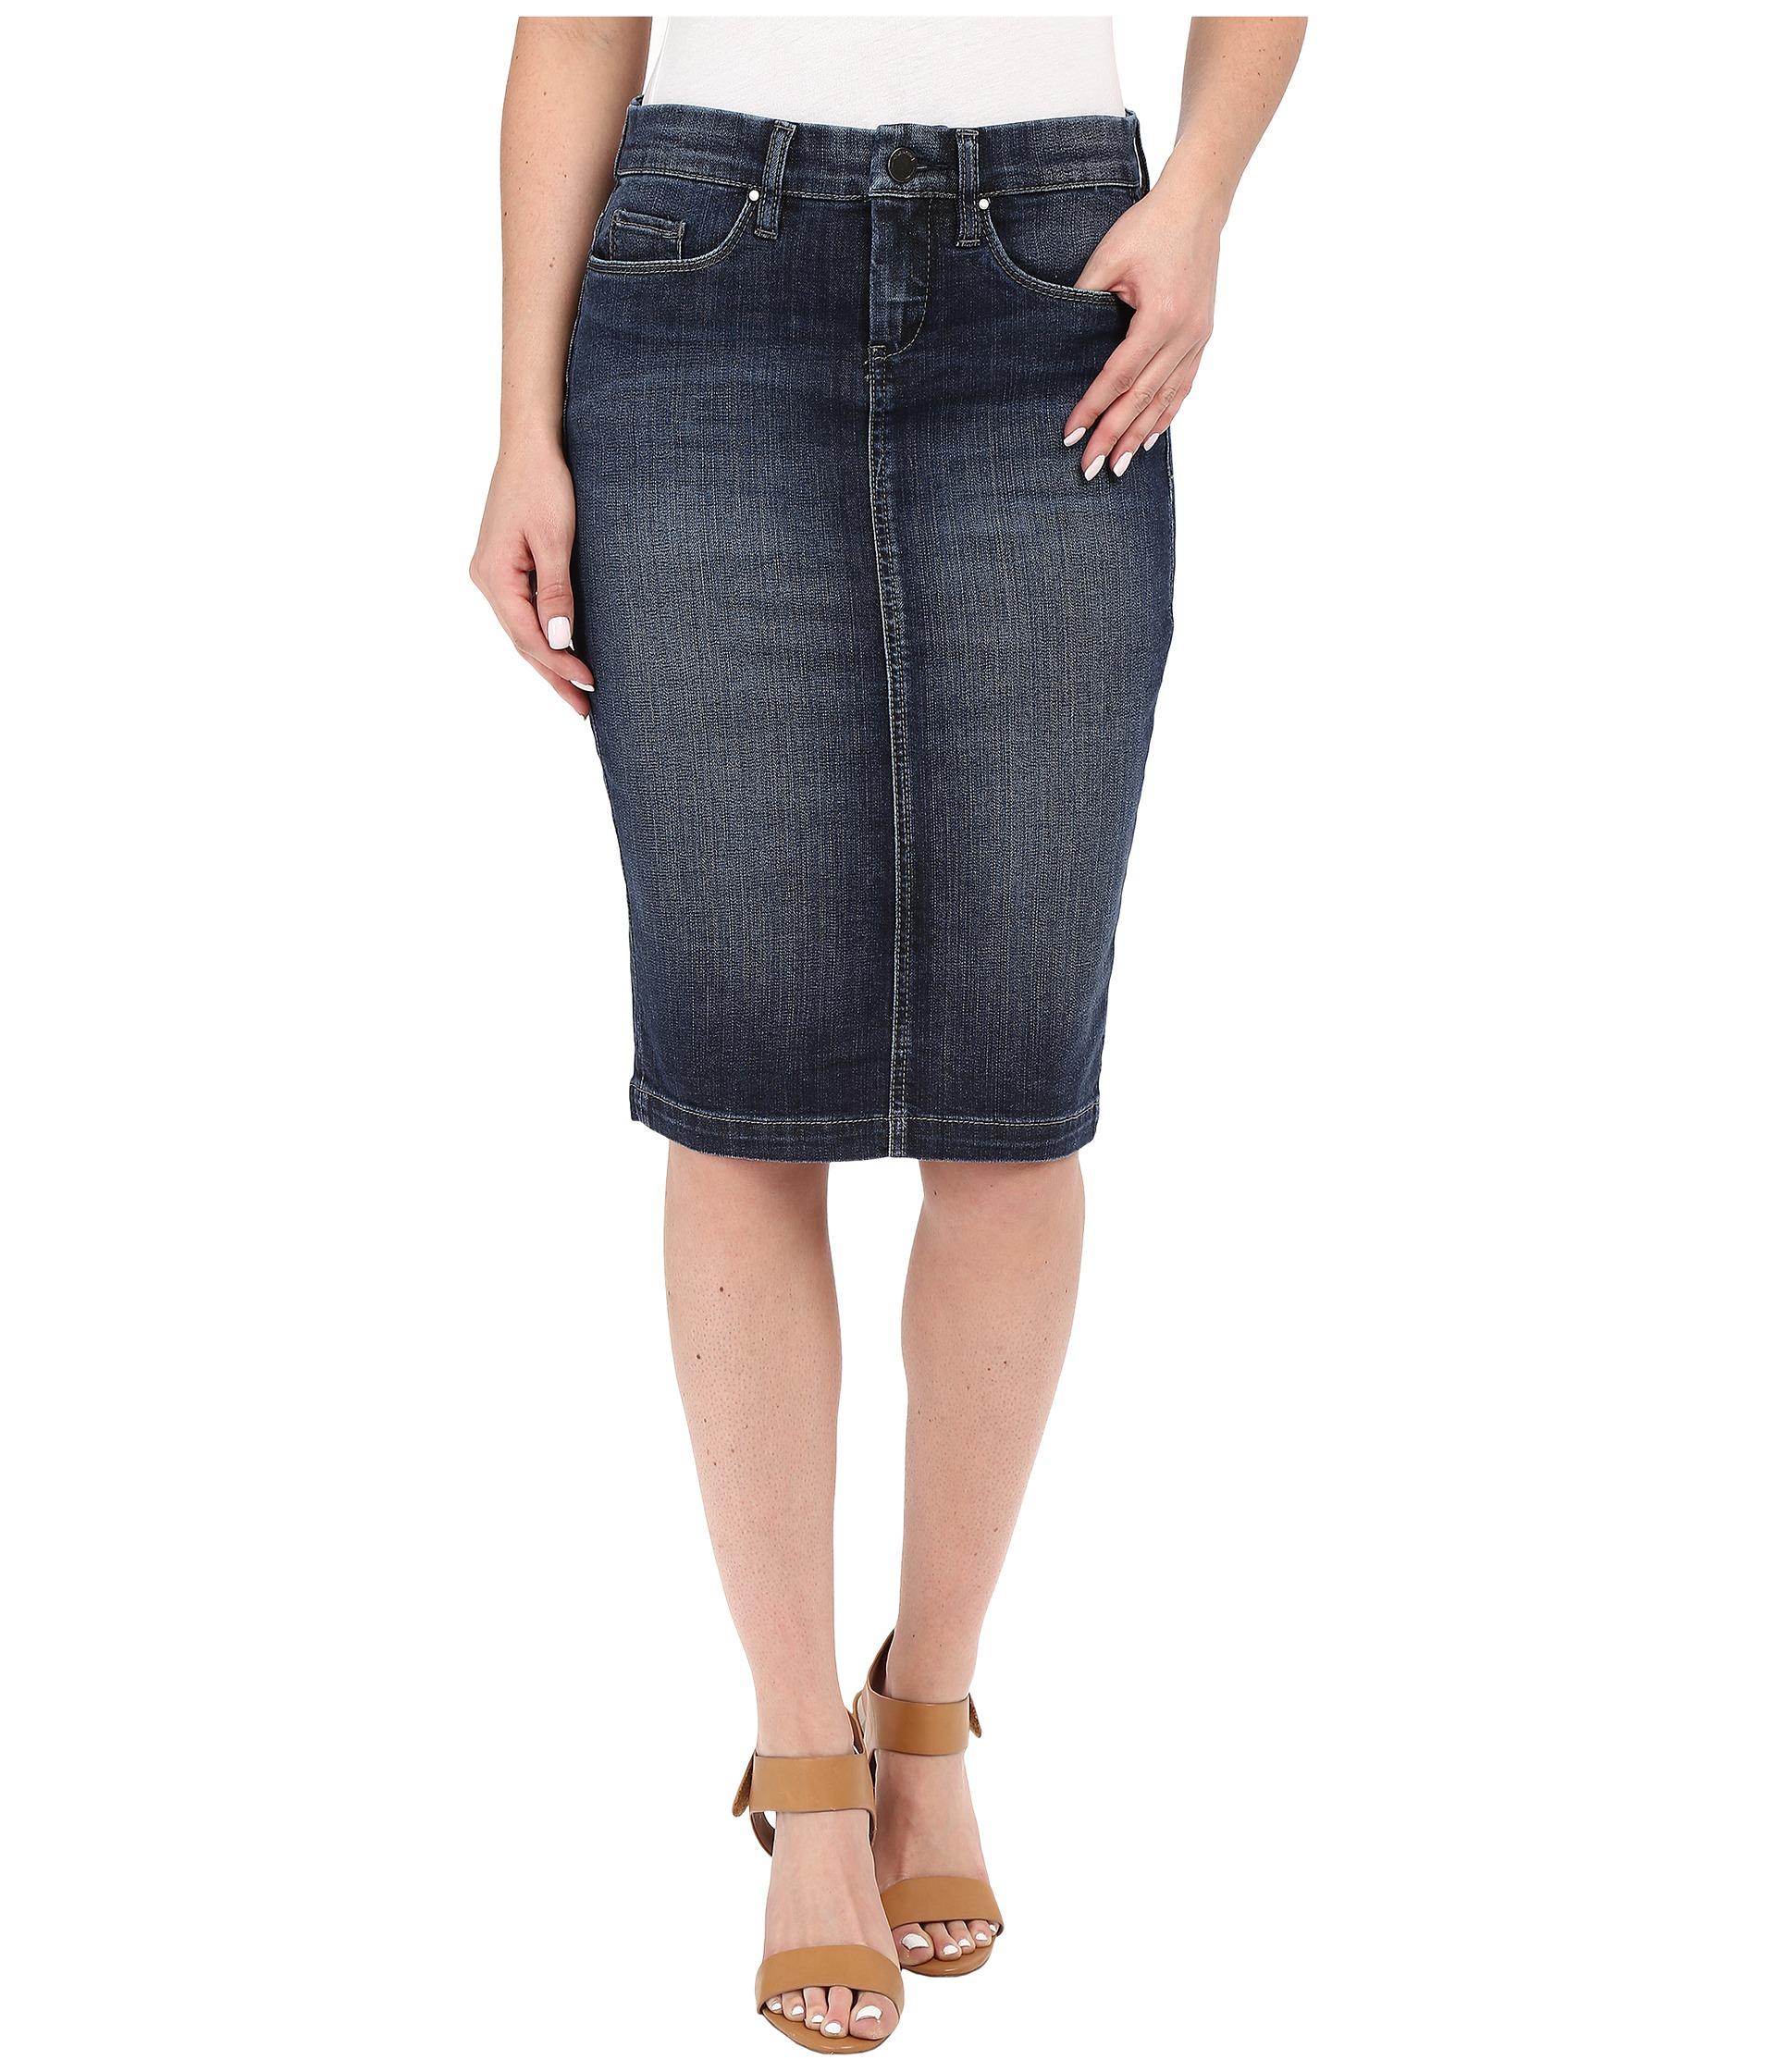 Two Piece Sporty Bandage Dress - Sports Bra Top